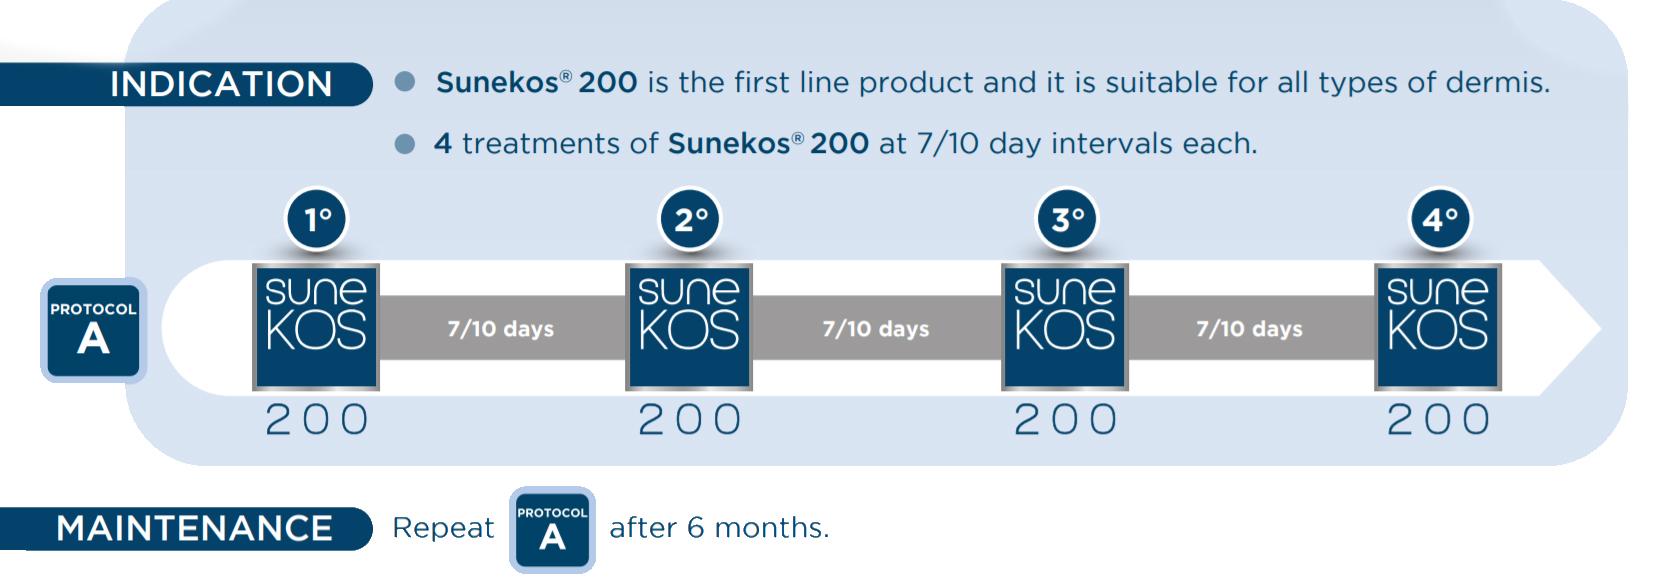 Standard Protocol Sunekos 200